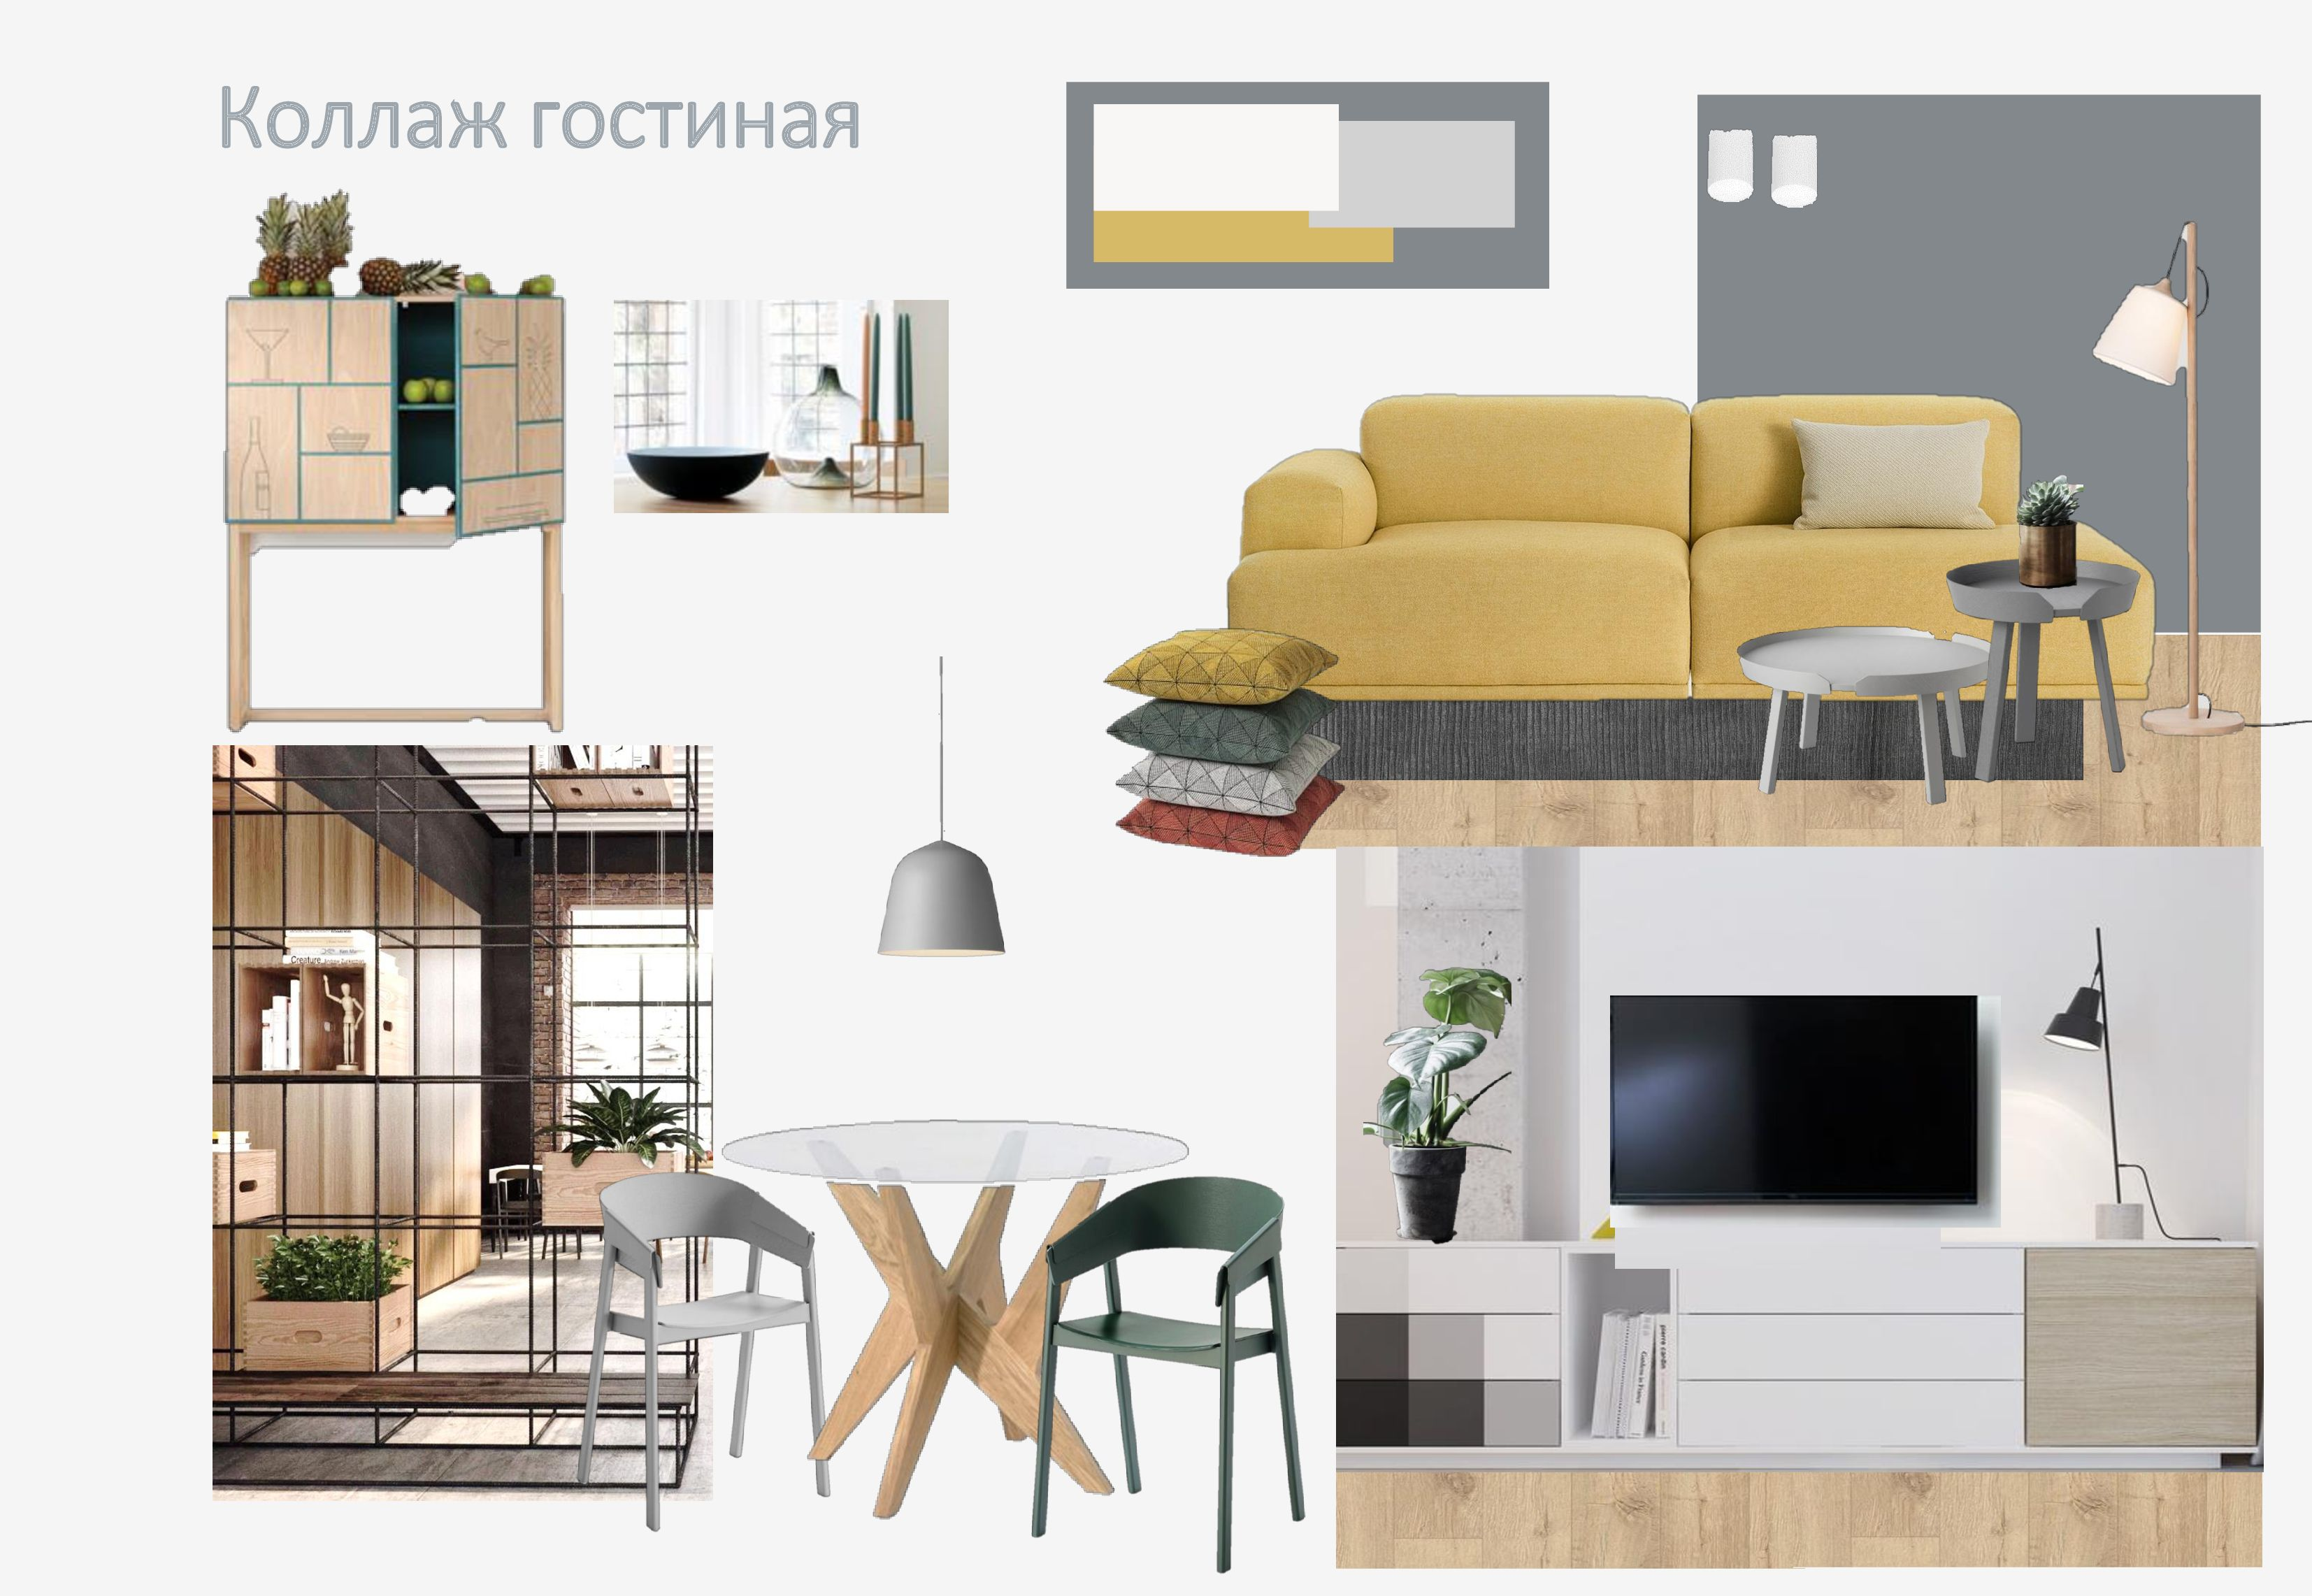 New nordic eco style living room collage by katerina gavriliuk interior decor course student in european design school kiev ukraine